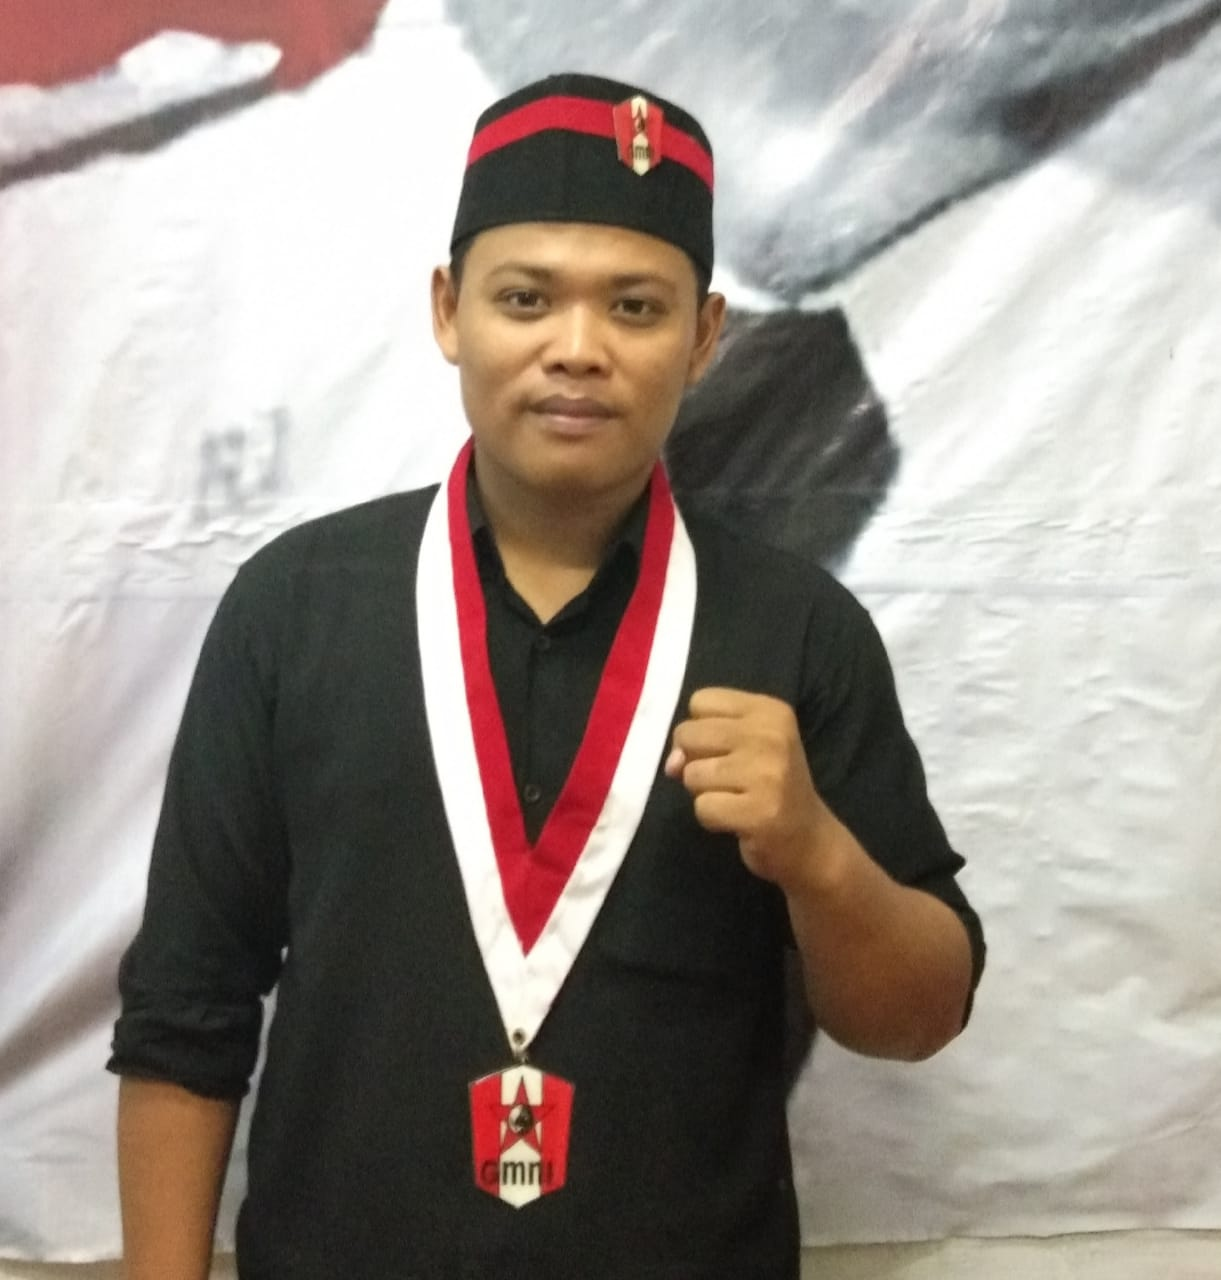 GMNI Medan, Pilkada Medan 2020 Kerja Keras Tingkatkan Pemilih